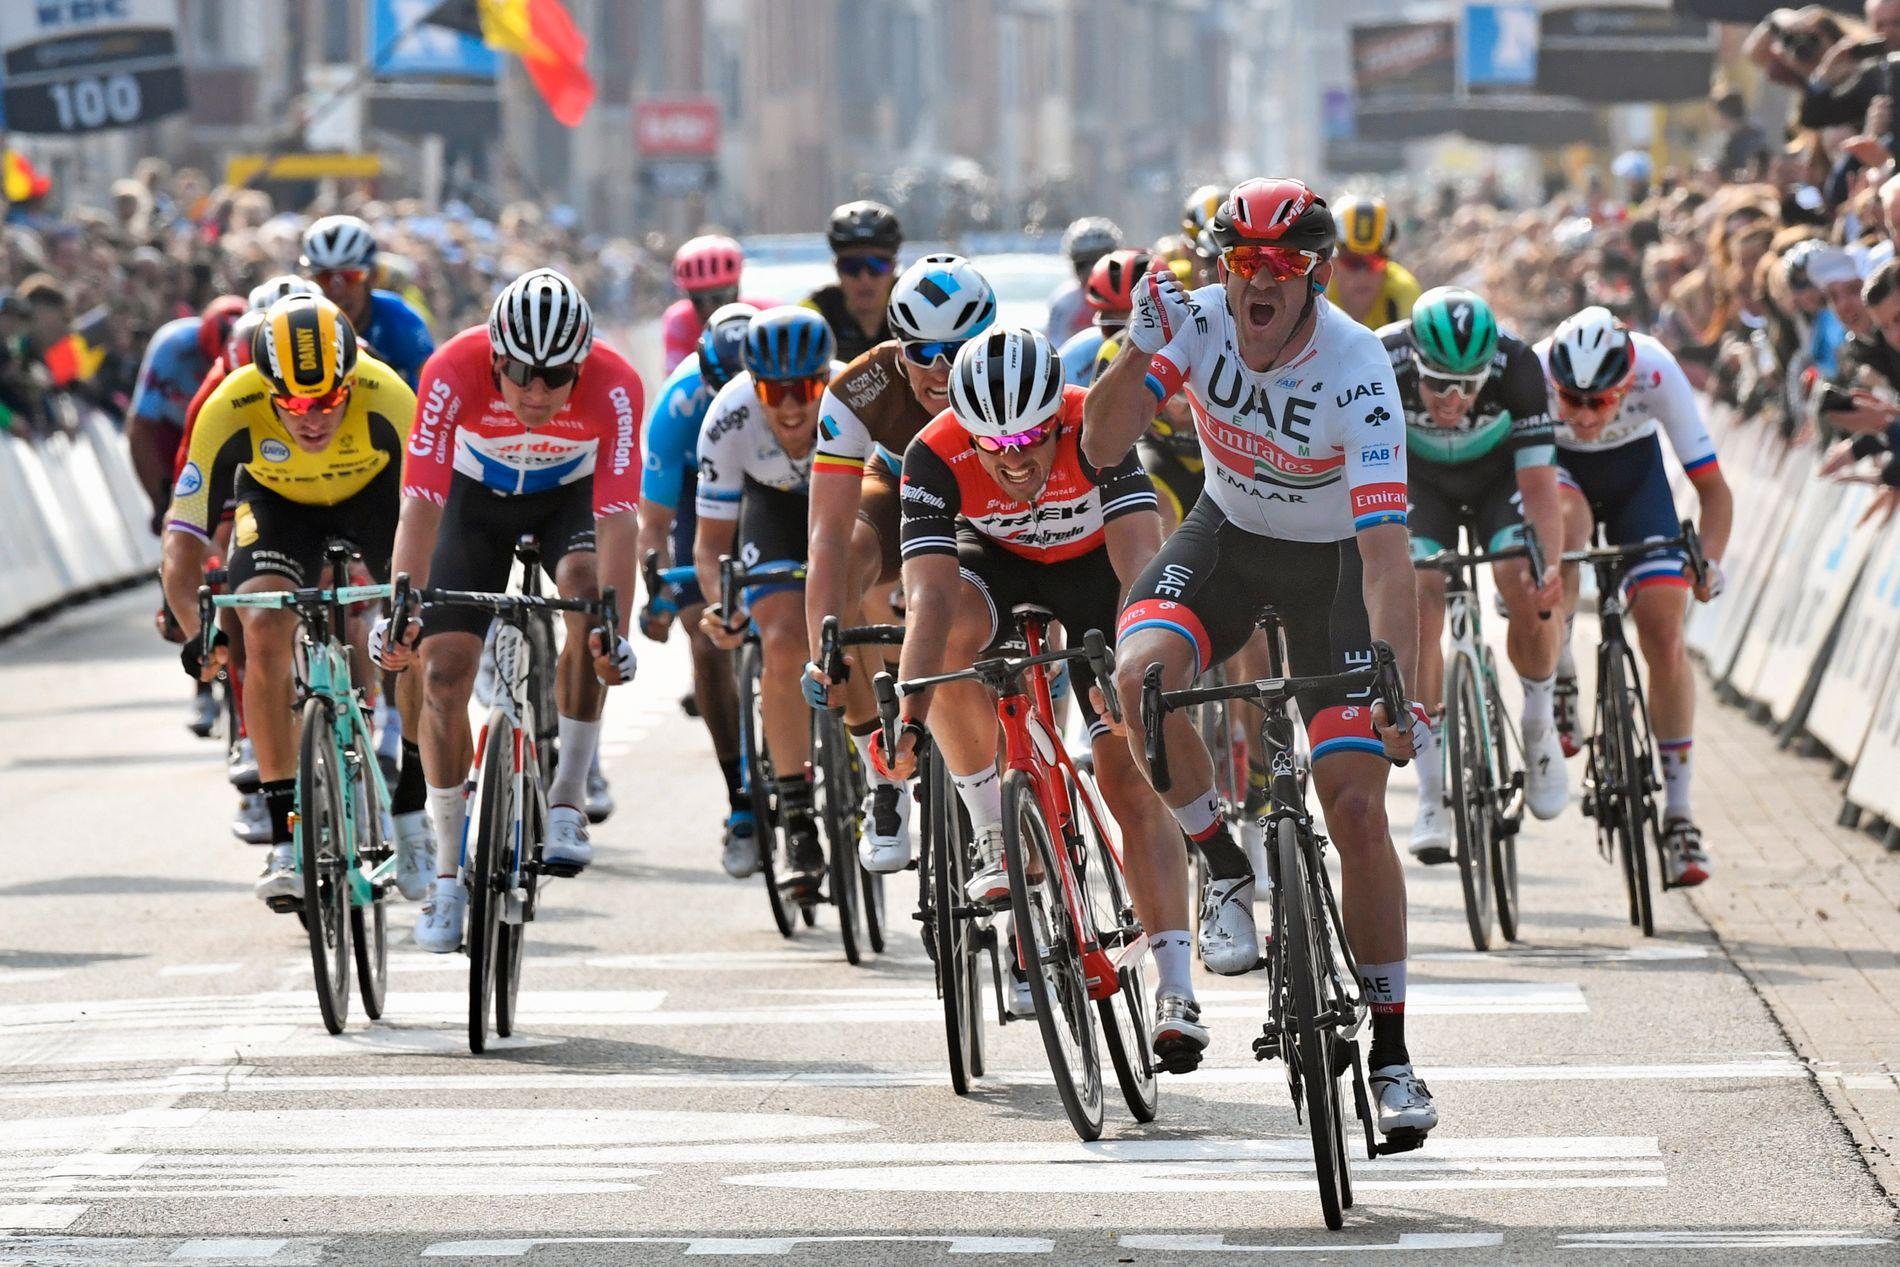 KLASSIKER: Kristoff har vist klassikerform i år, og spesielt seieren i Gent-Wevelgem var imponerende.